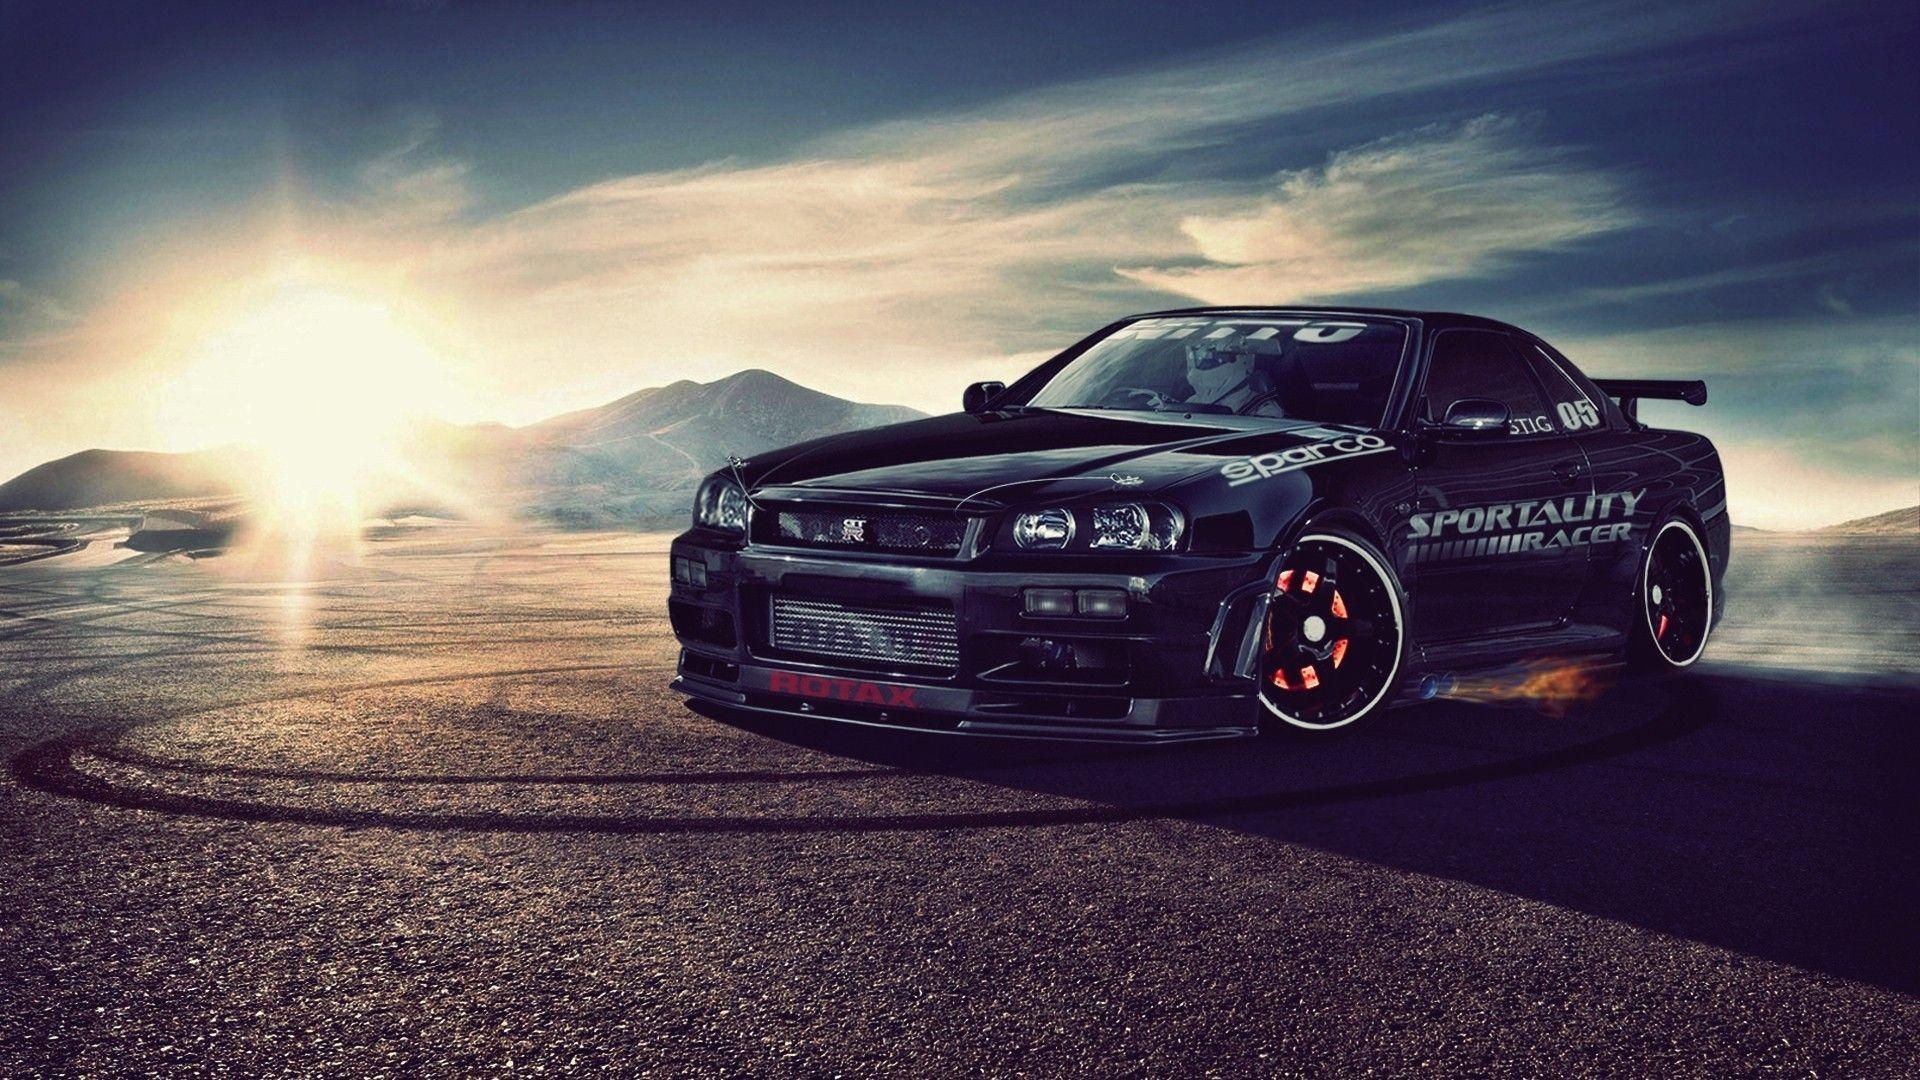 Best 50+ Nissan Skyline Gtr R34 Drift Car - work quotes